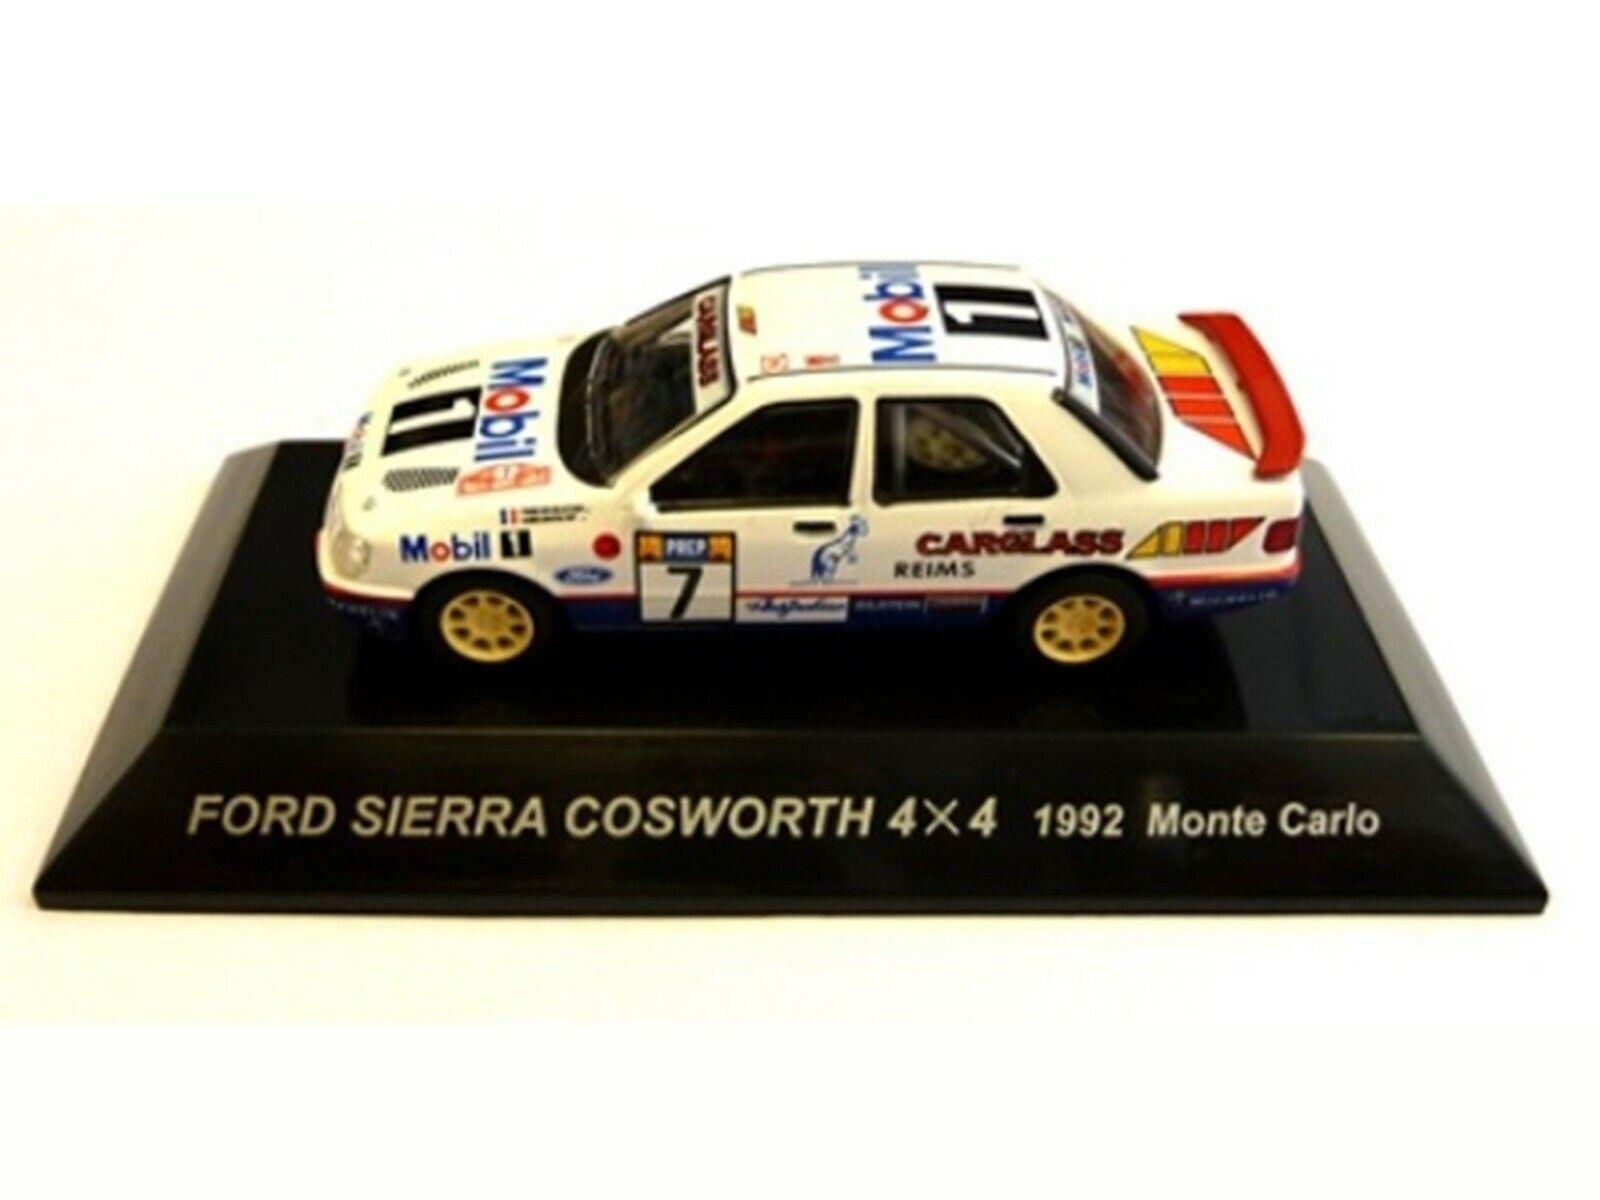 Wow extrêmeHommest rare FORD  SIERRA RS COSWORTH 1992 4x4 M. voiturelo WRC 1 64 cm 'S KYOSHO  nouveau sadie